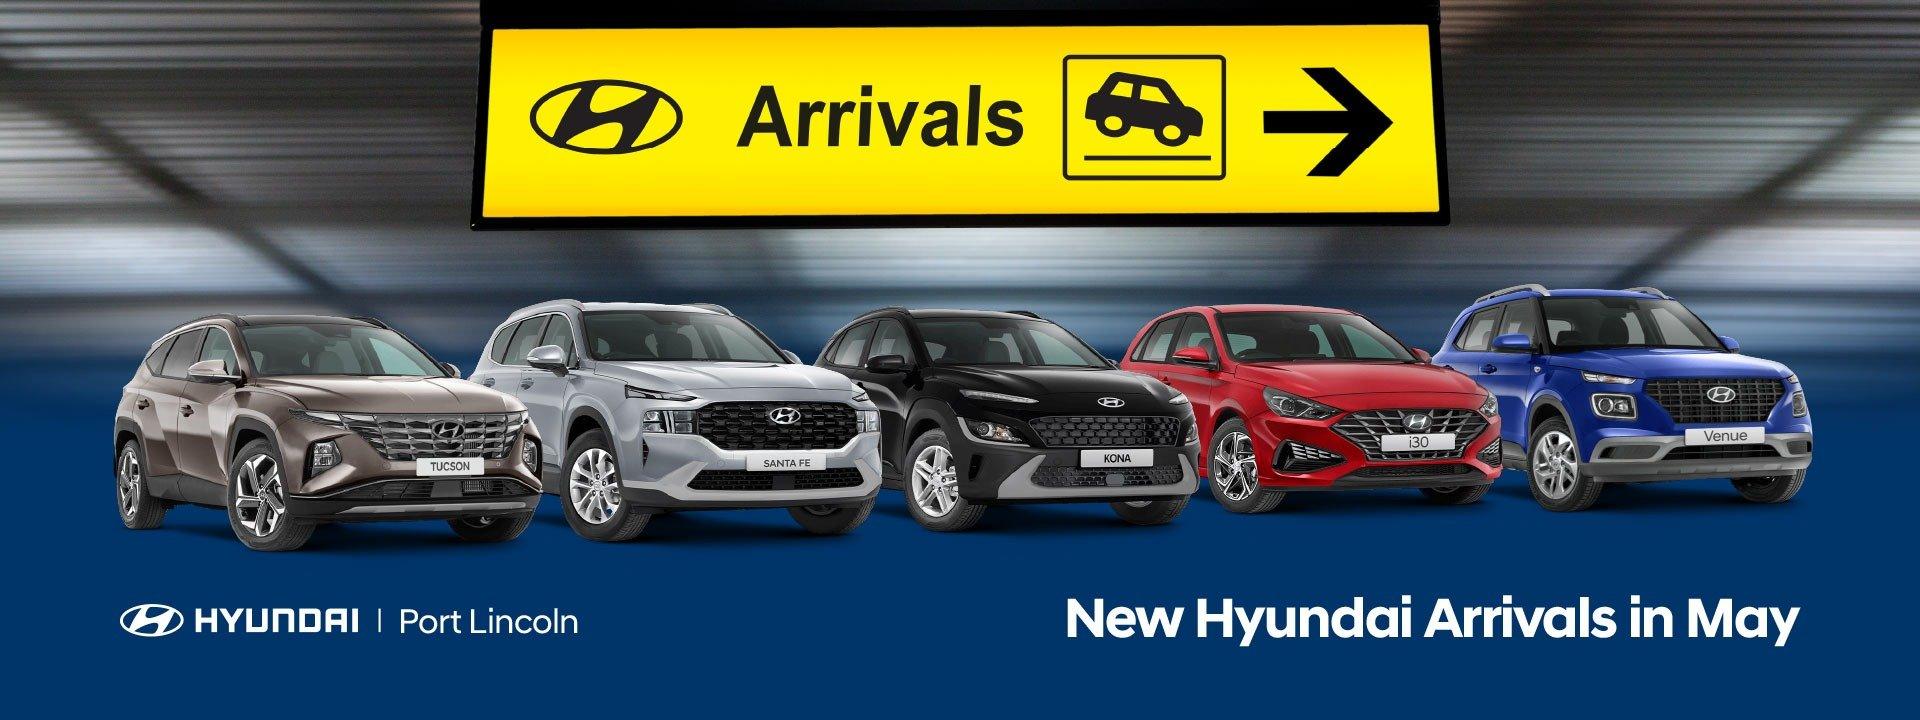 Port Lincoln Hyundai | New Arrivals